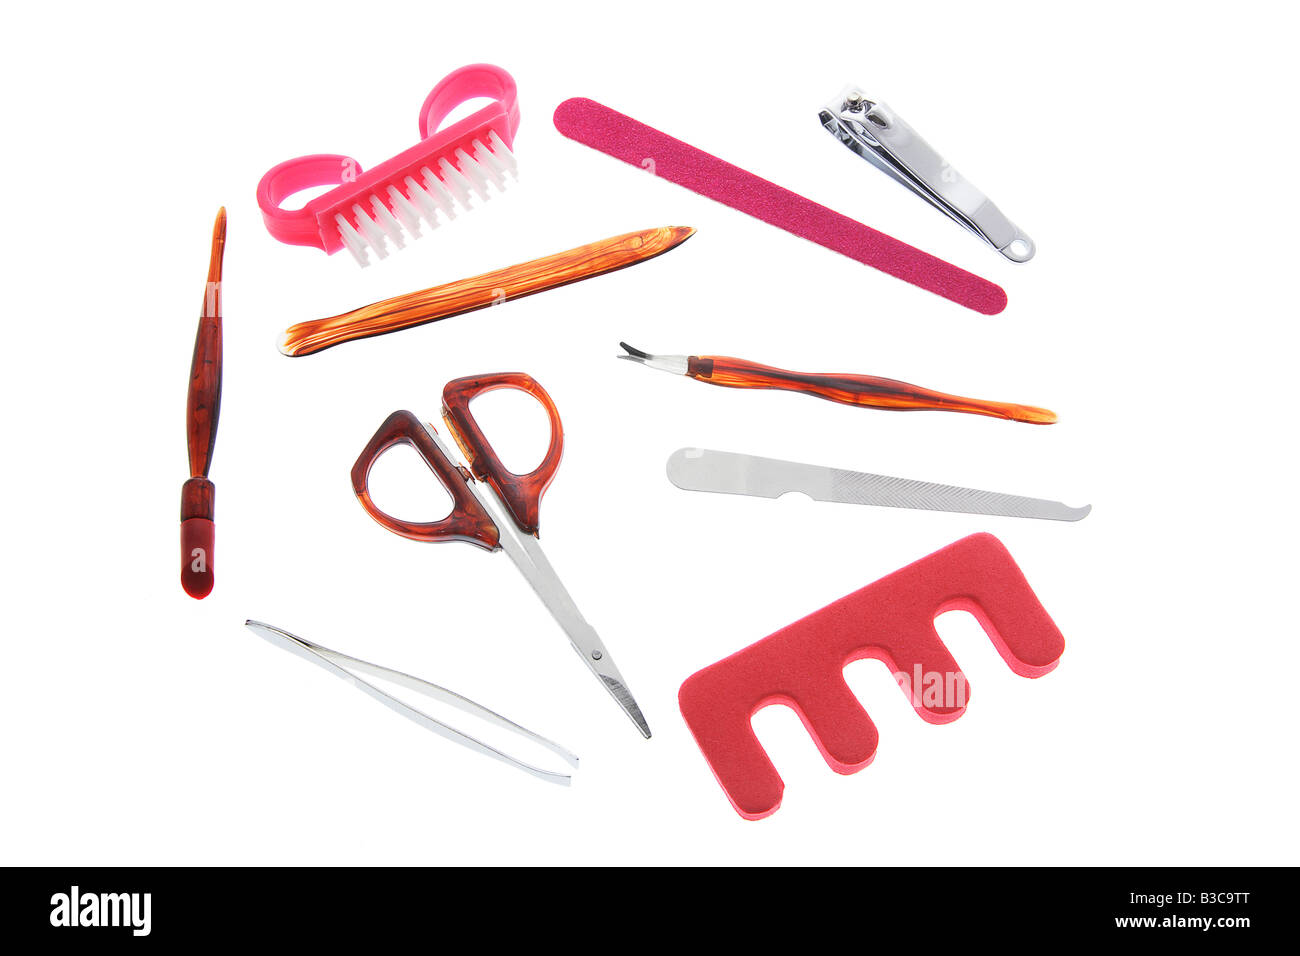 Manicure Items - Stock Image